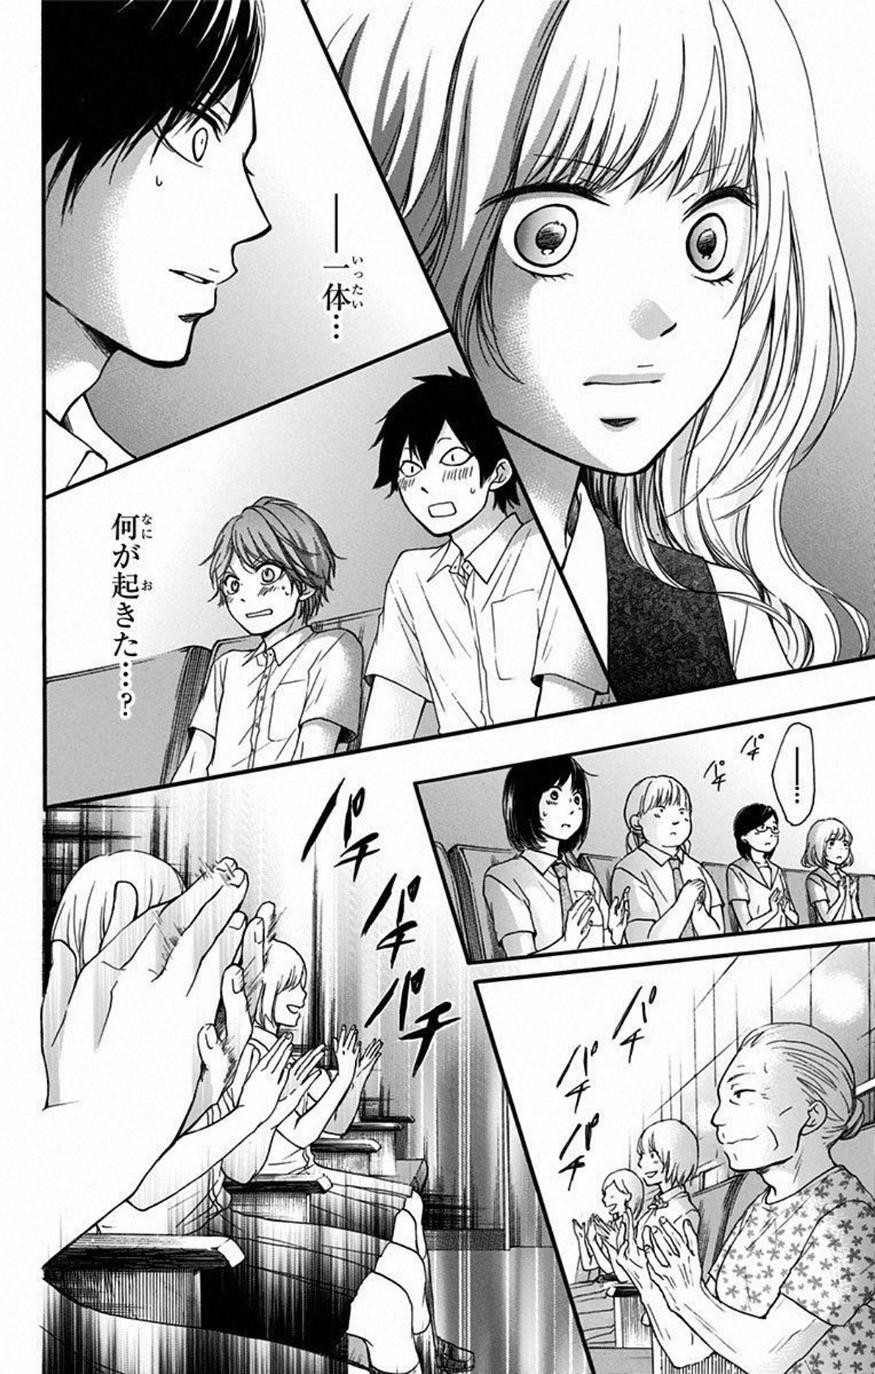 Kono Oto Tomare! - Chapter 27 - Page 2